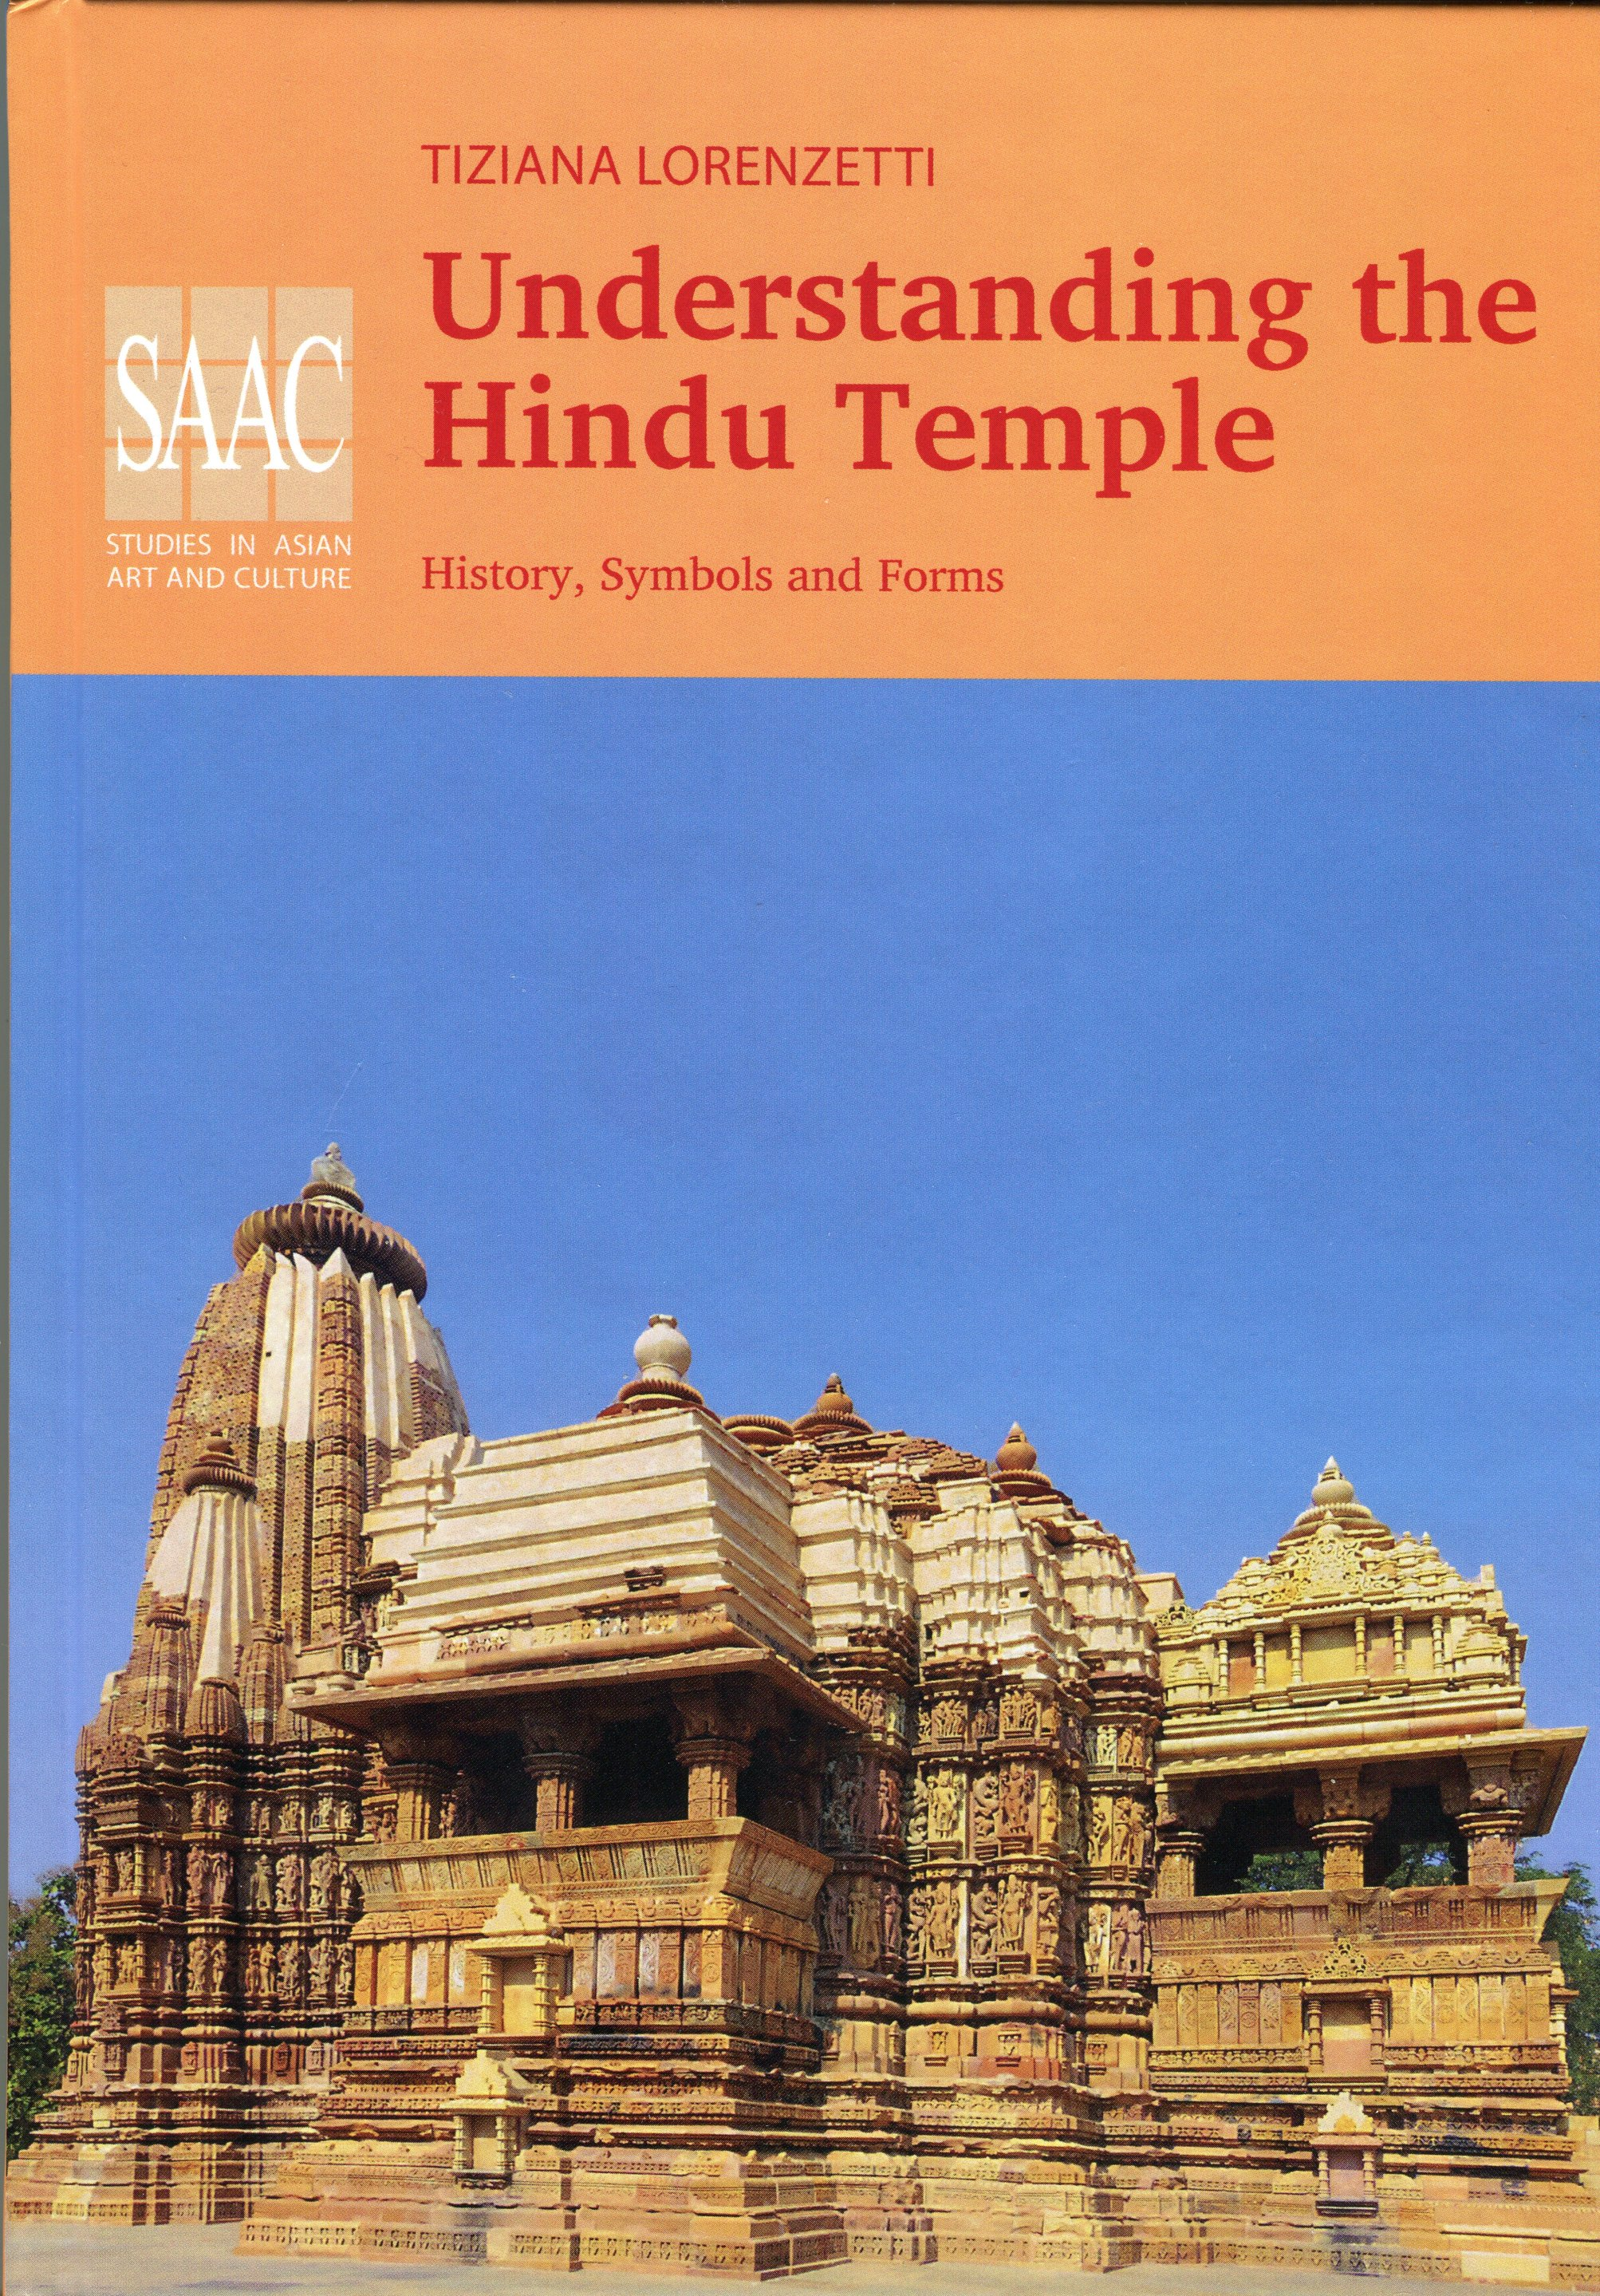 rsz_the_hindu_temple